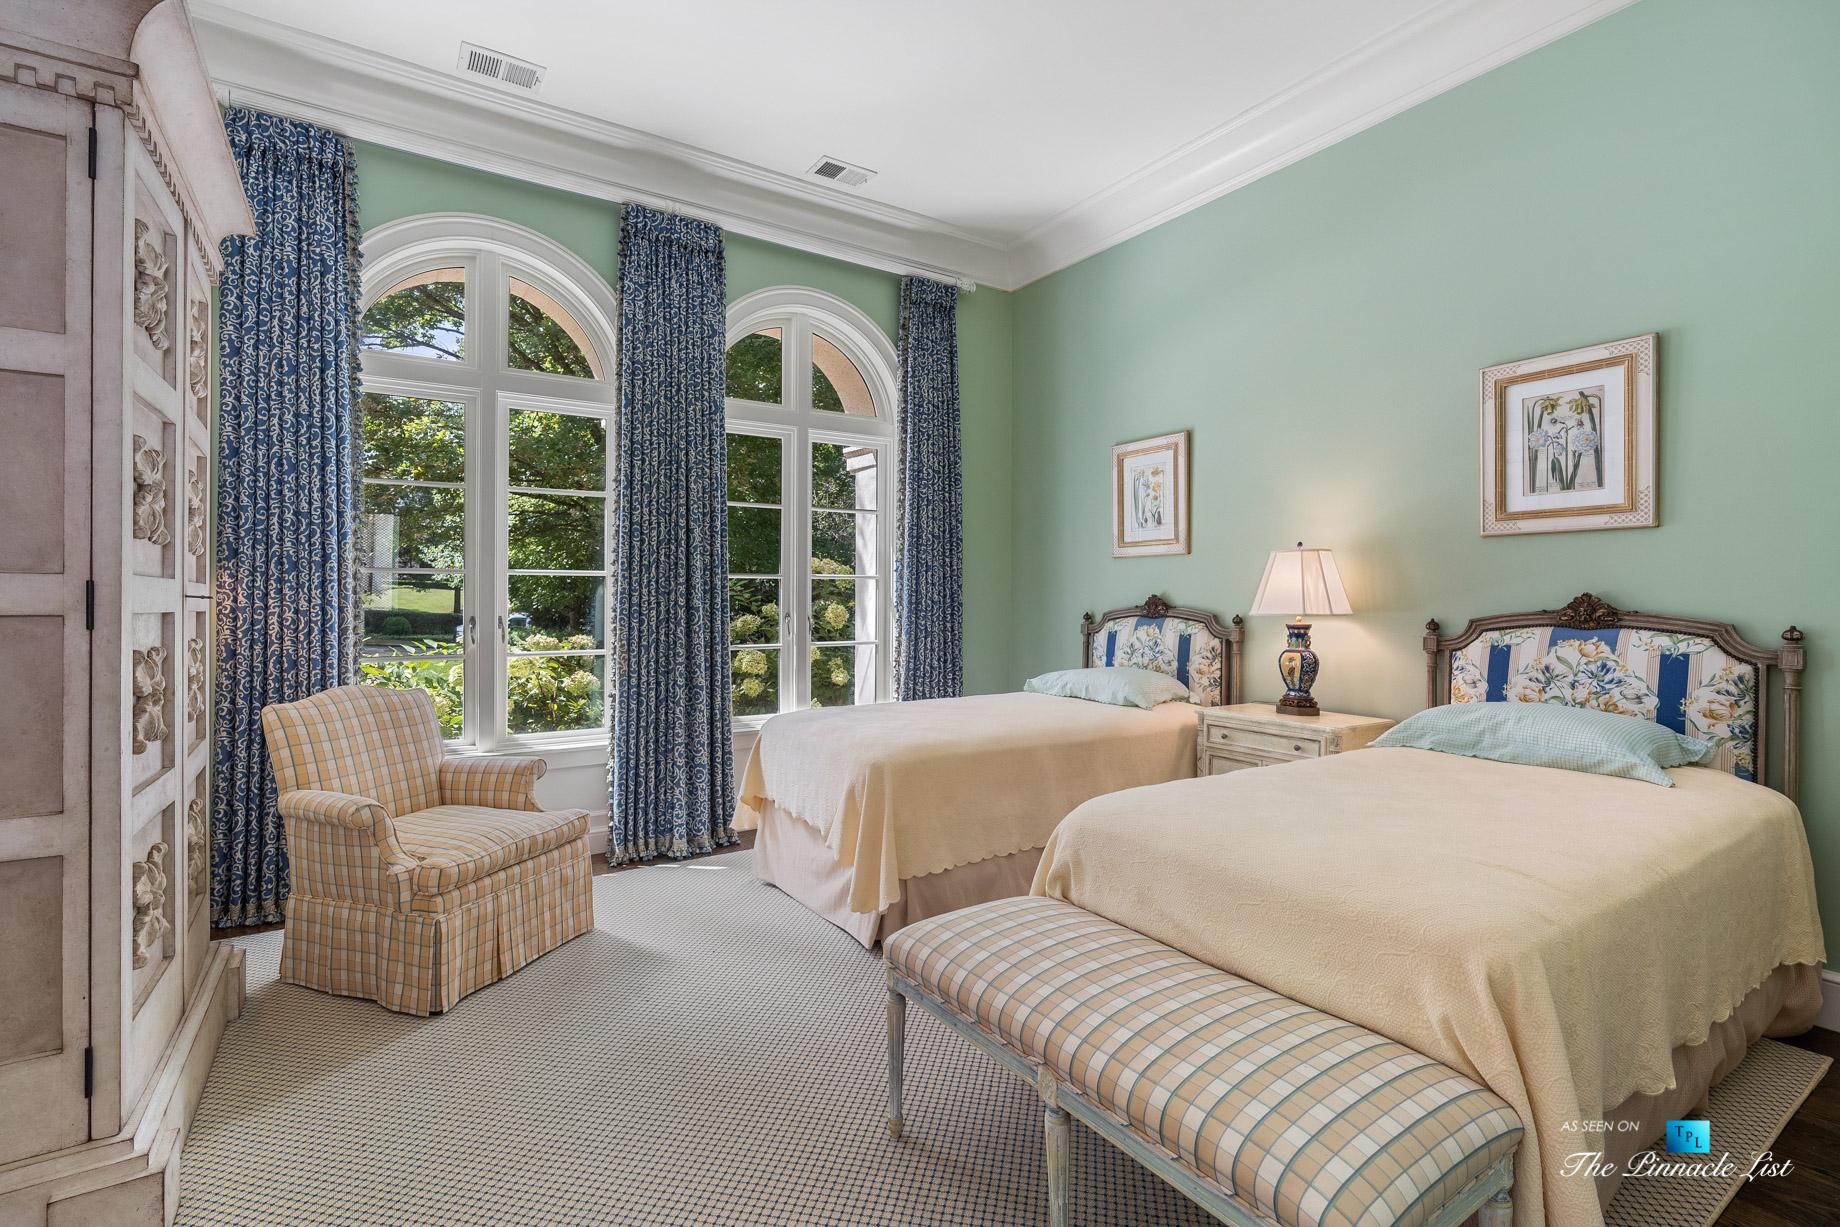 439 Blackland Rd NW, Atlanta, GA, USA - Bedroom - Luxury Real Estate - Tuxedo Park Mediterranean Mansion Home